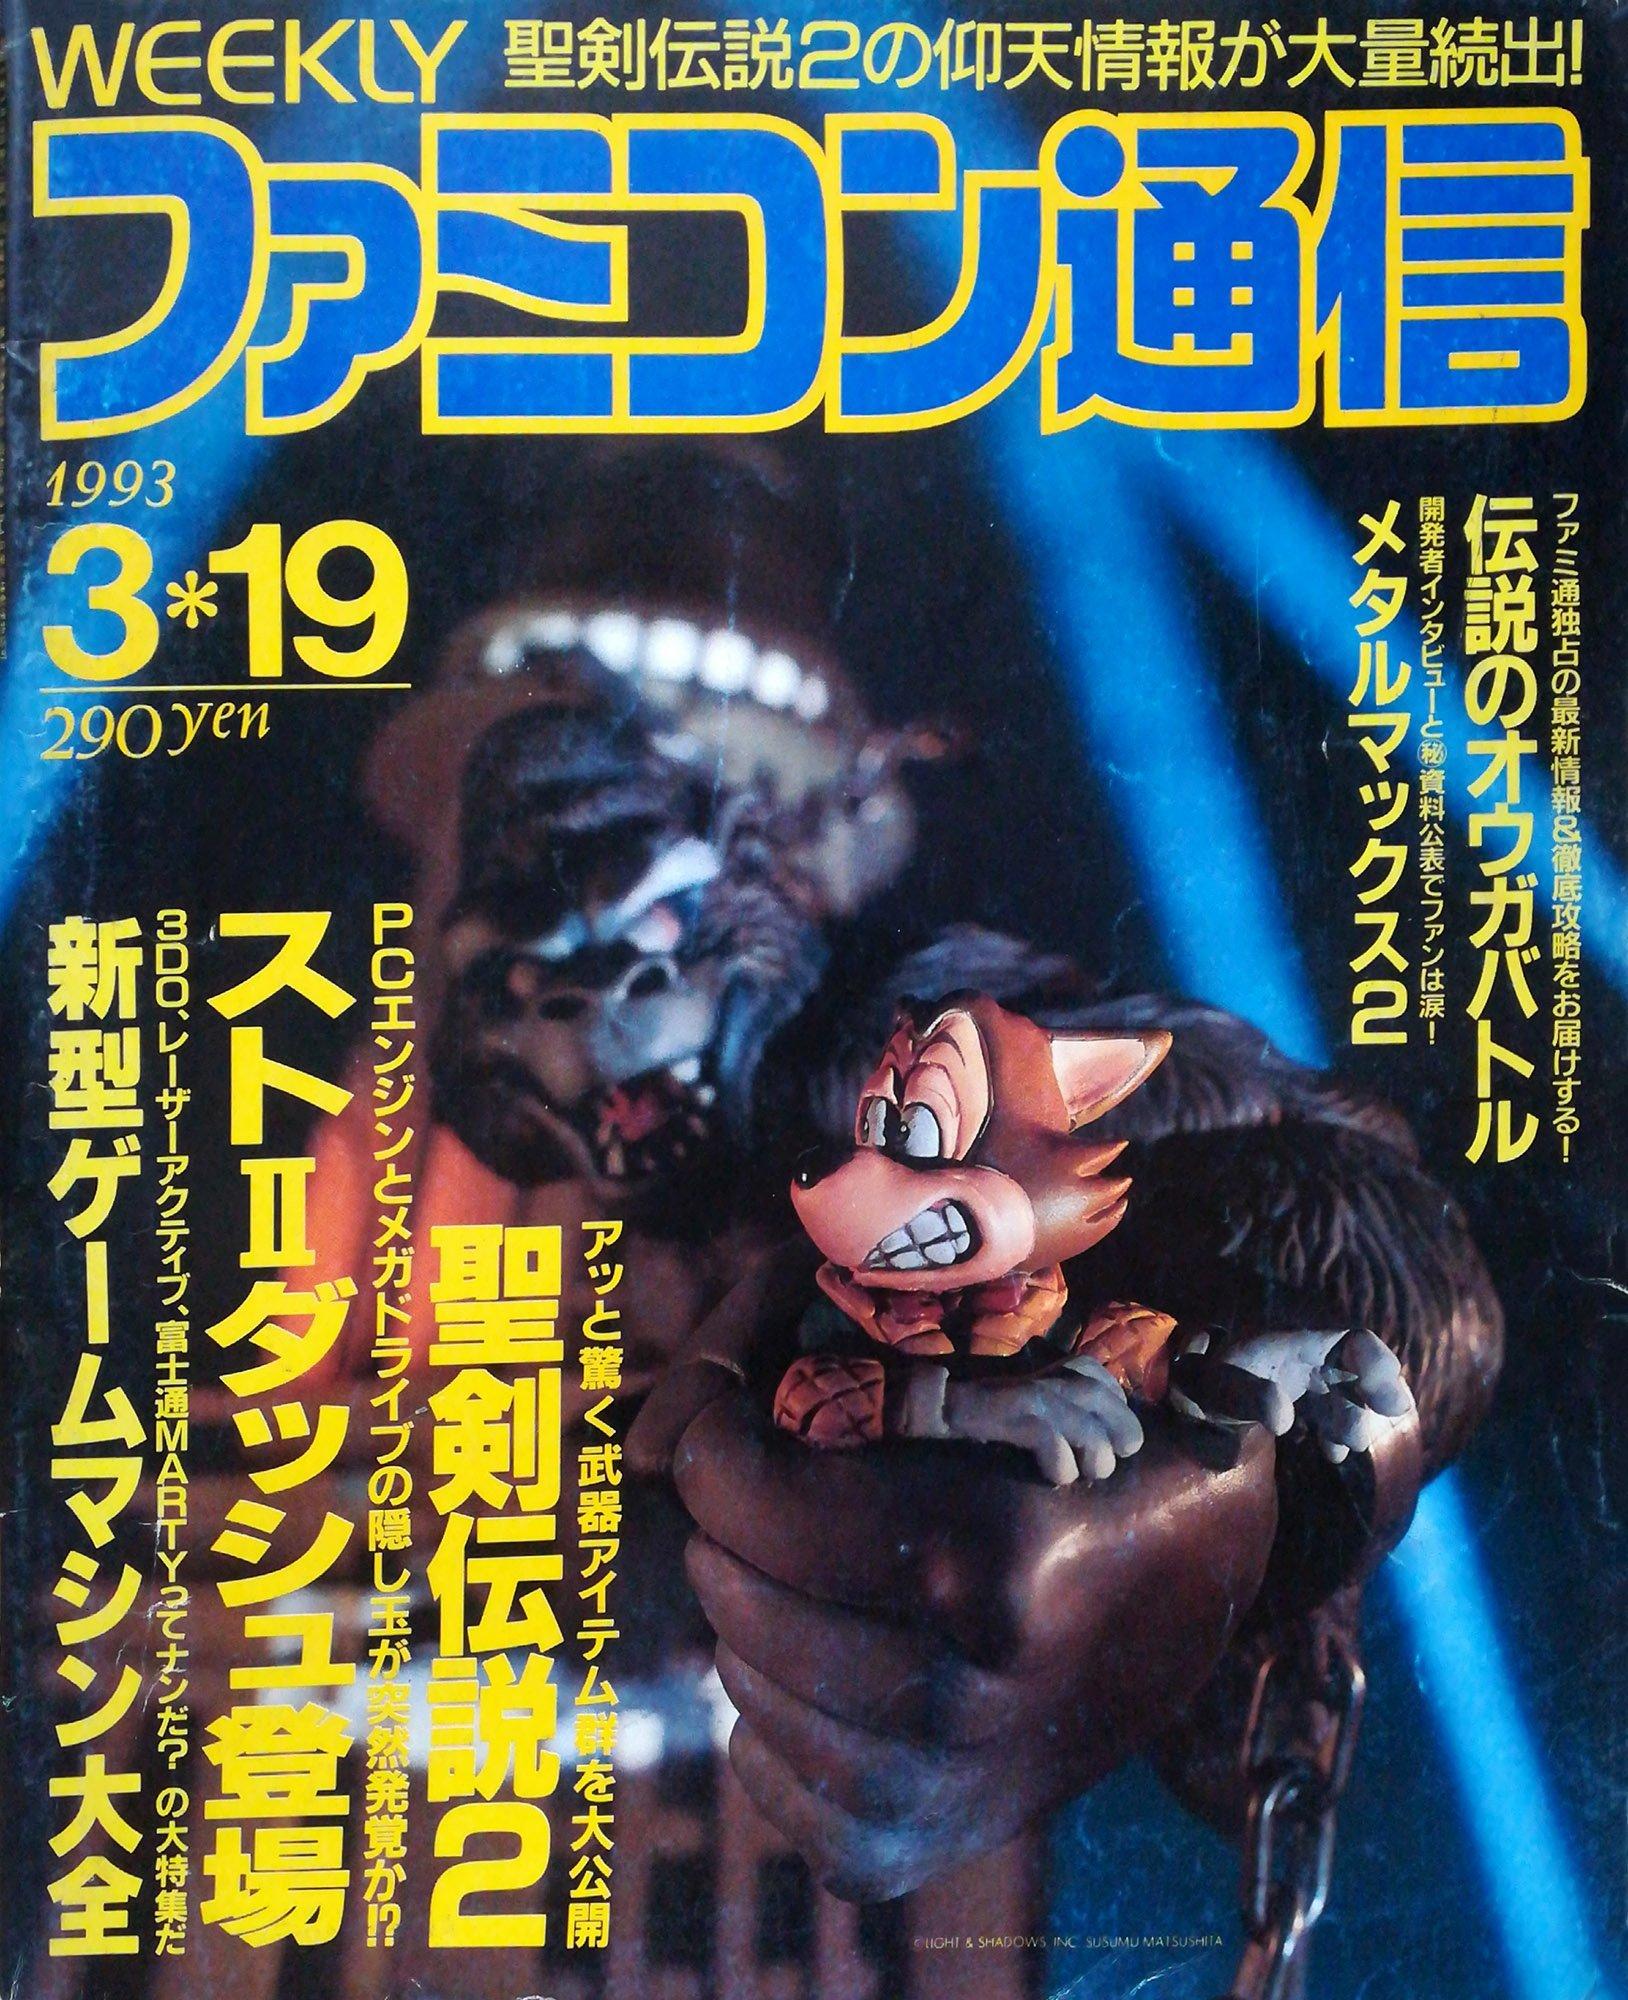 Famitsu 0222 (March 19, 1993)